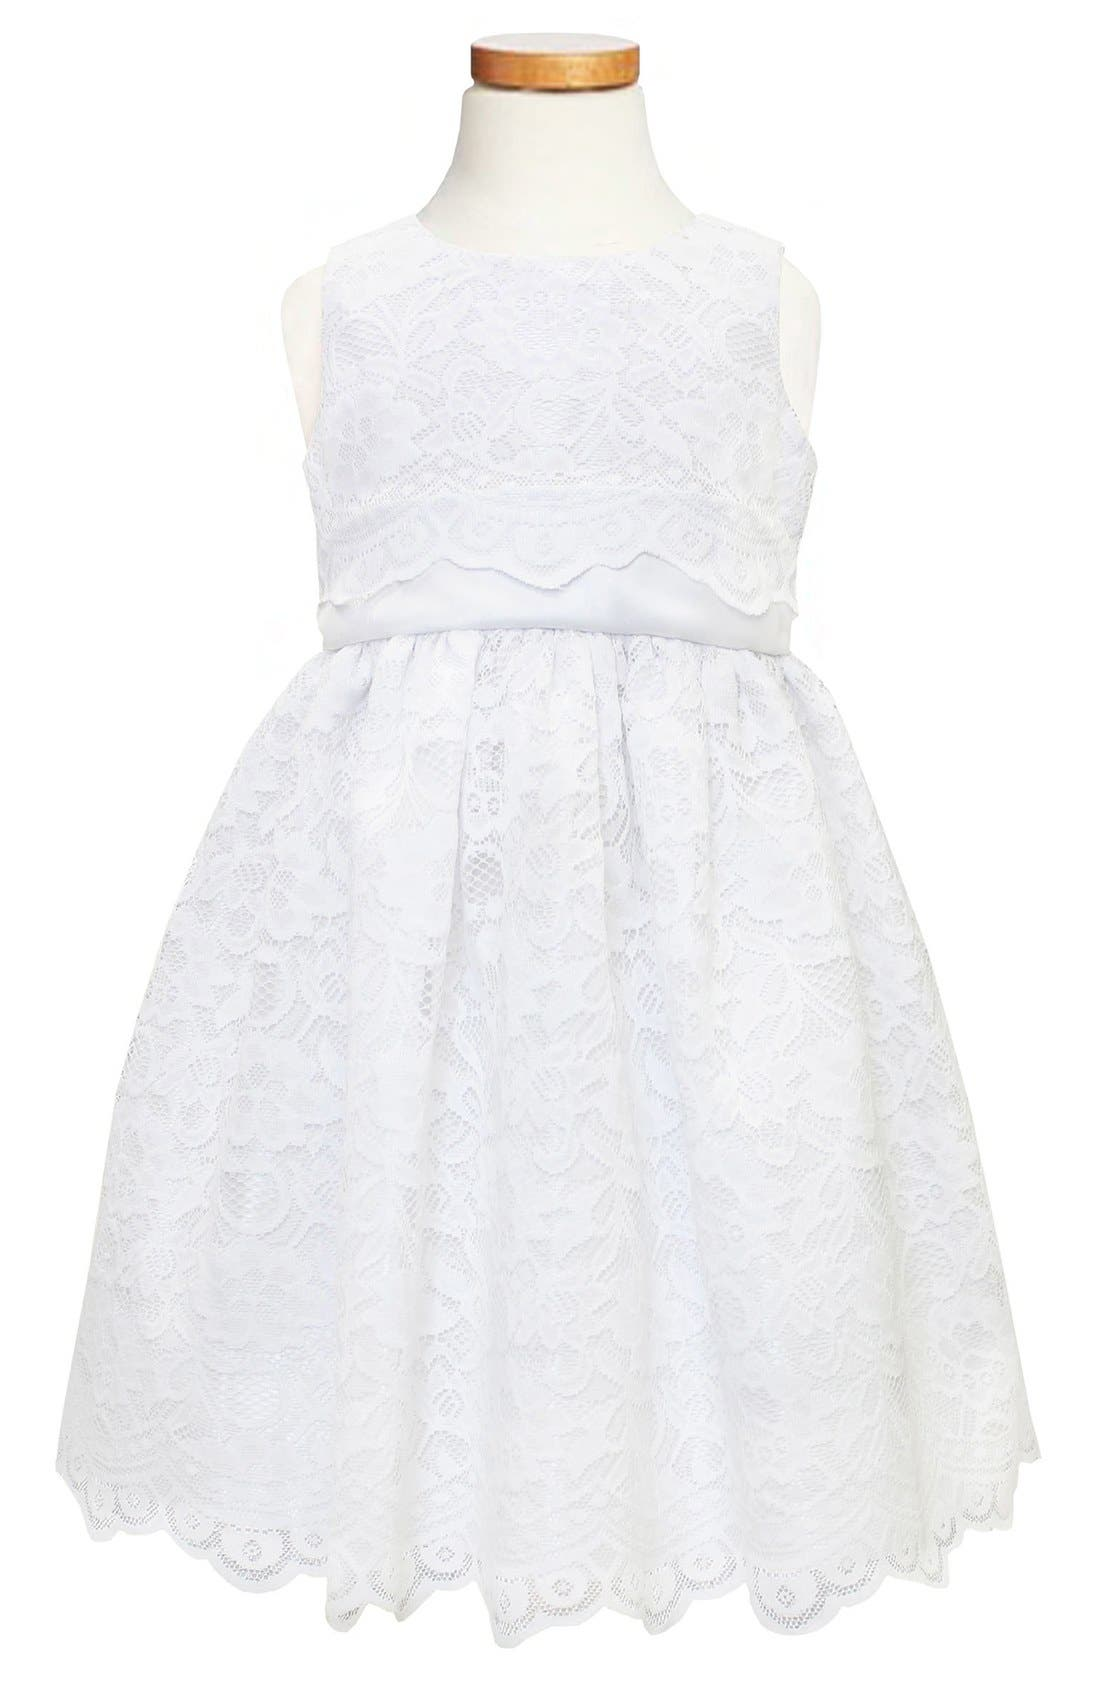 Sorbet Scallop Lace Dress (Toddler Girls & Little Girls)